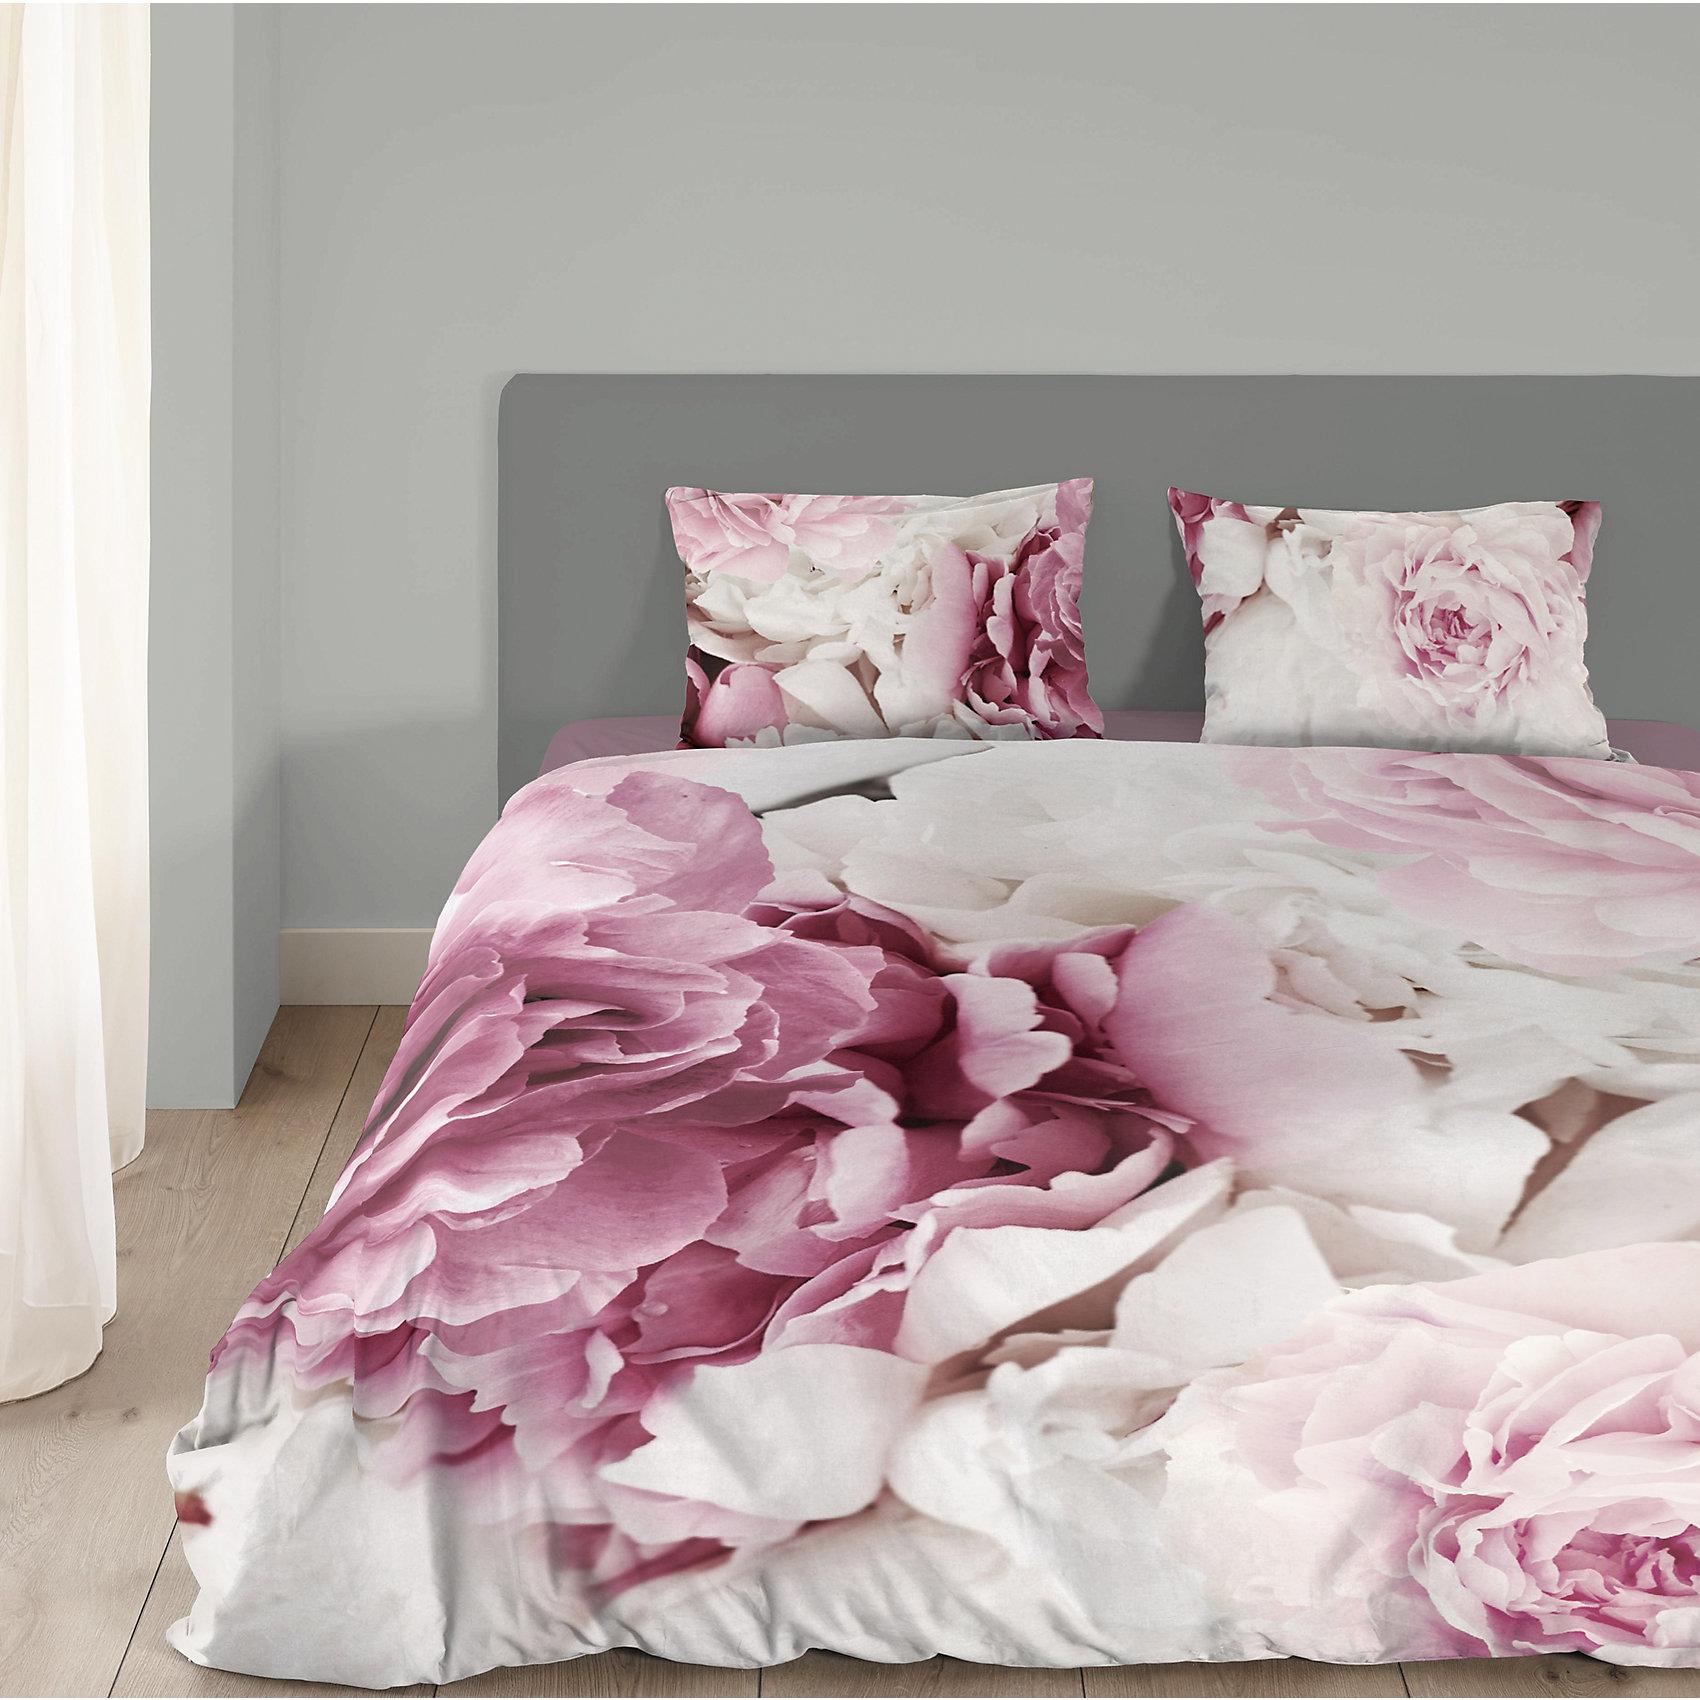 Neu Good Morning Bedlinens Bettwäsche Peonies 6057566 Rosaweiß Ebay